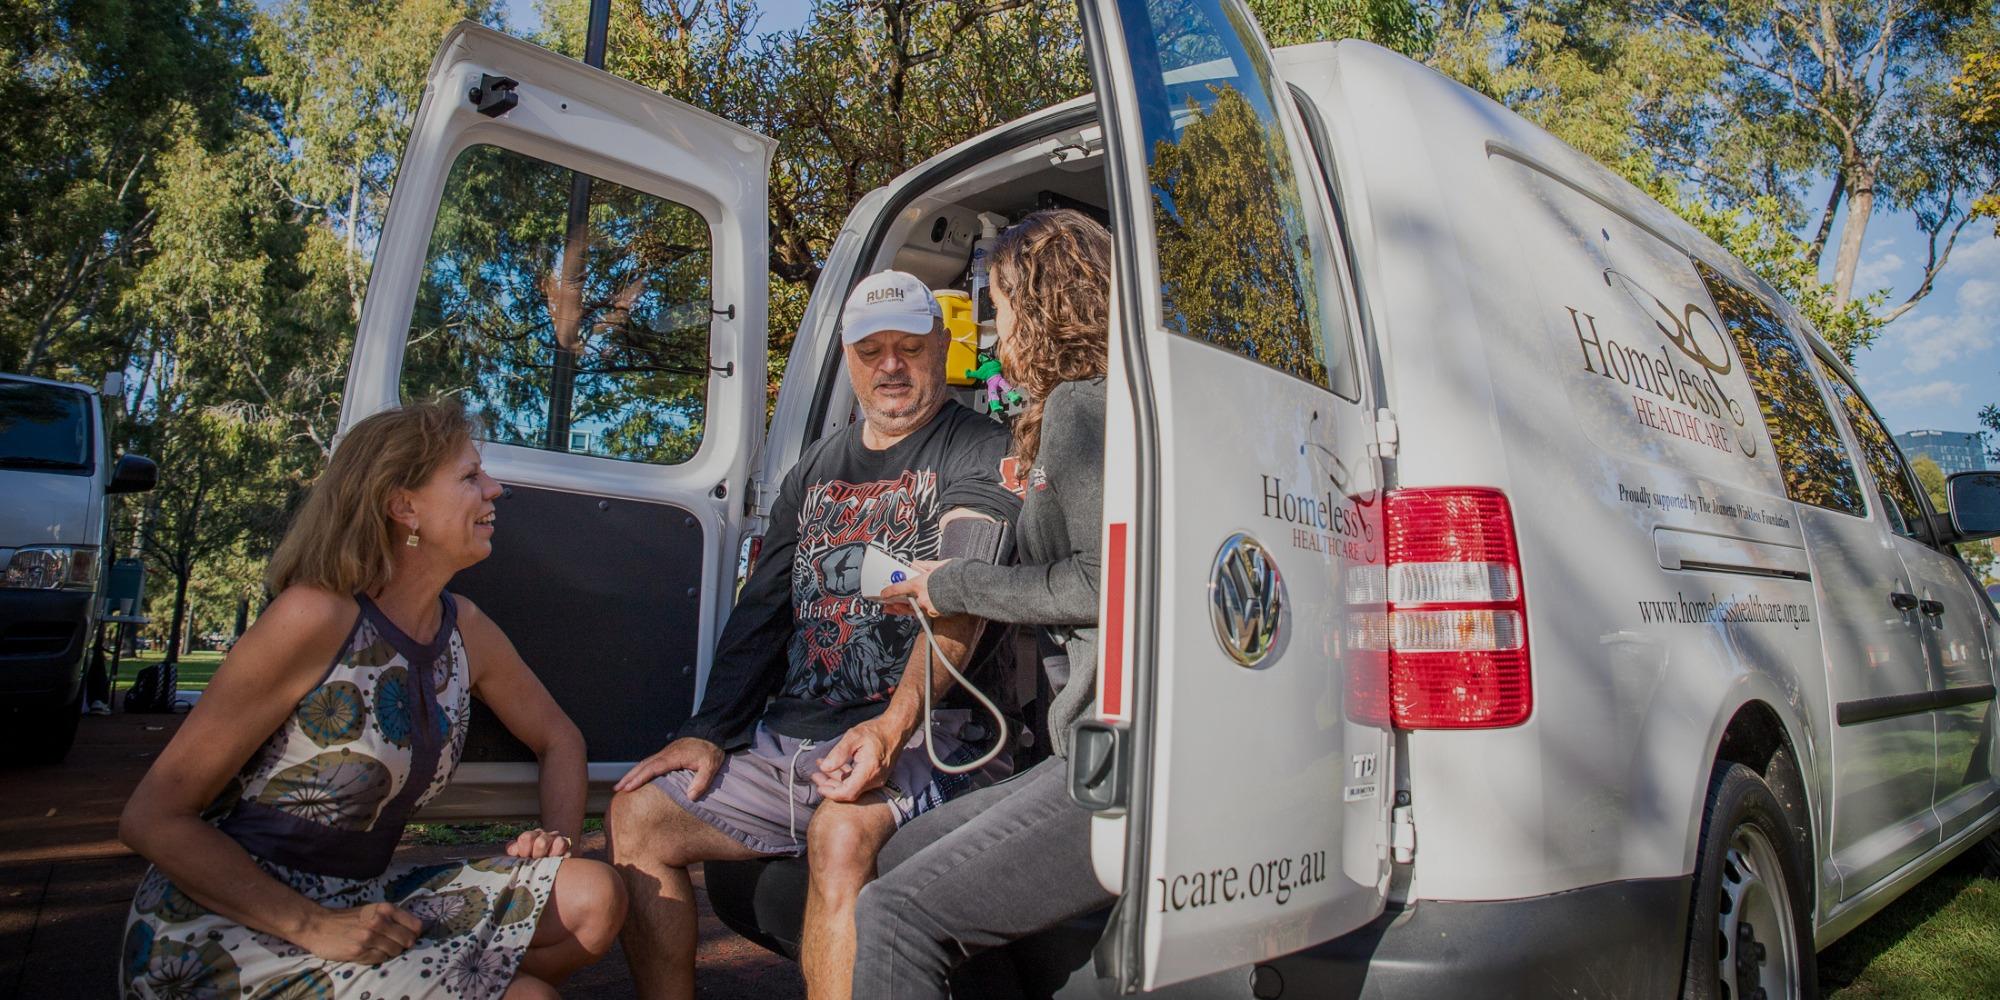 Professor Lisa Wood with the Homelessness van